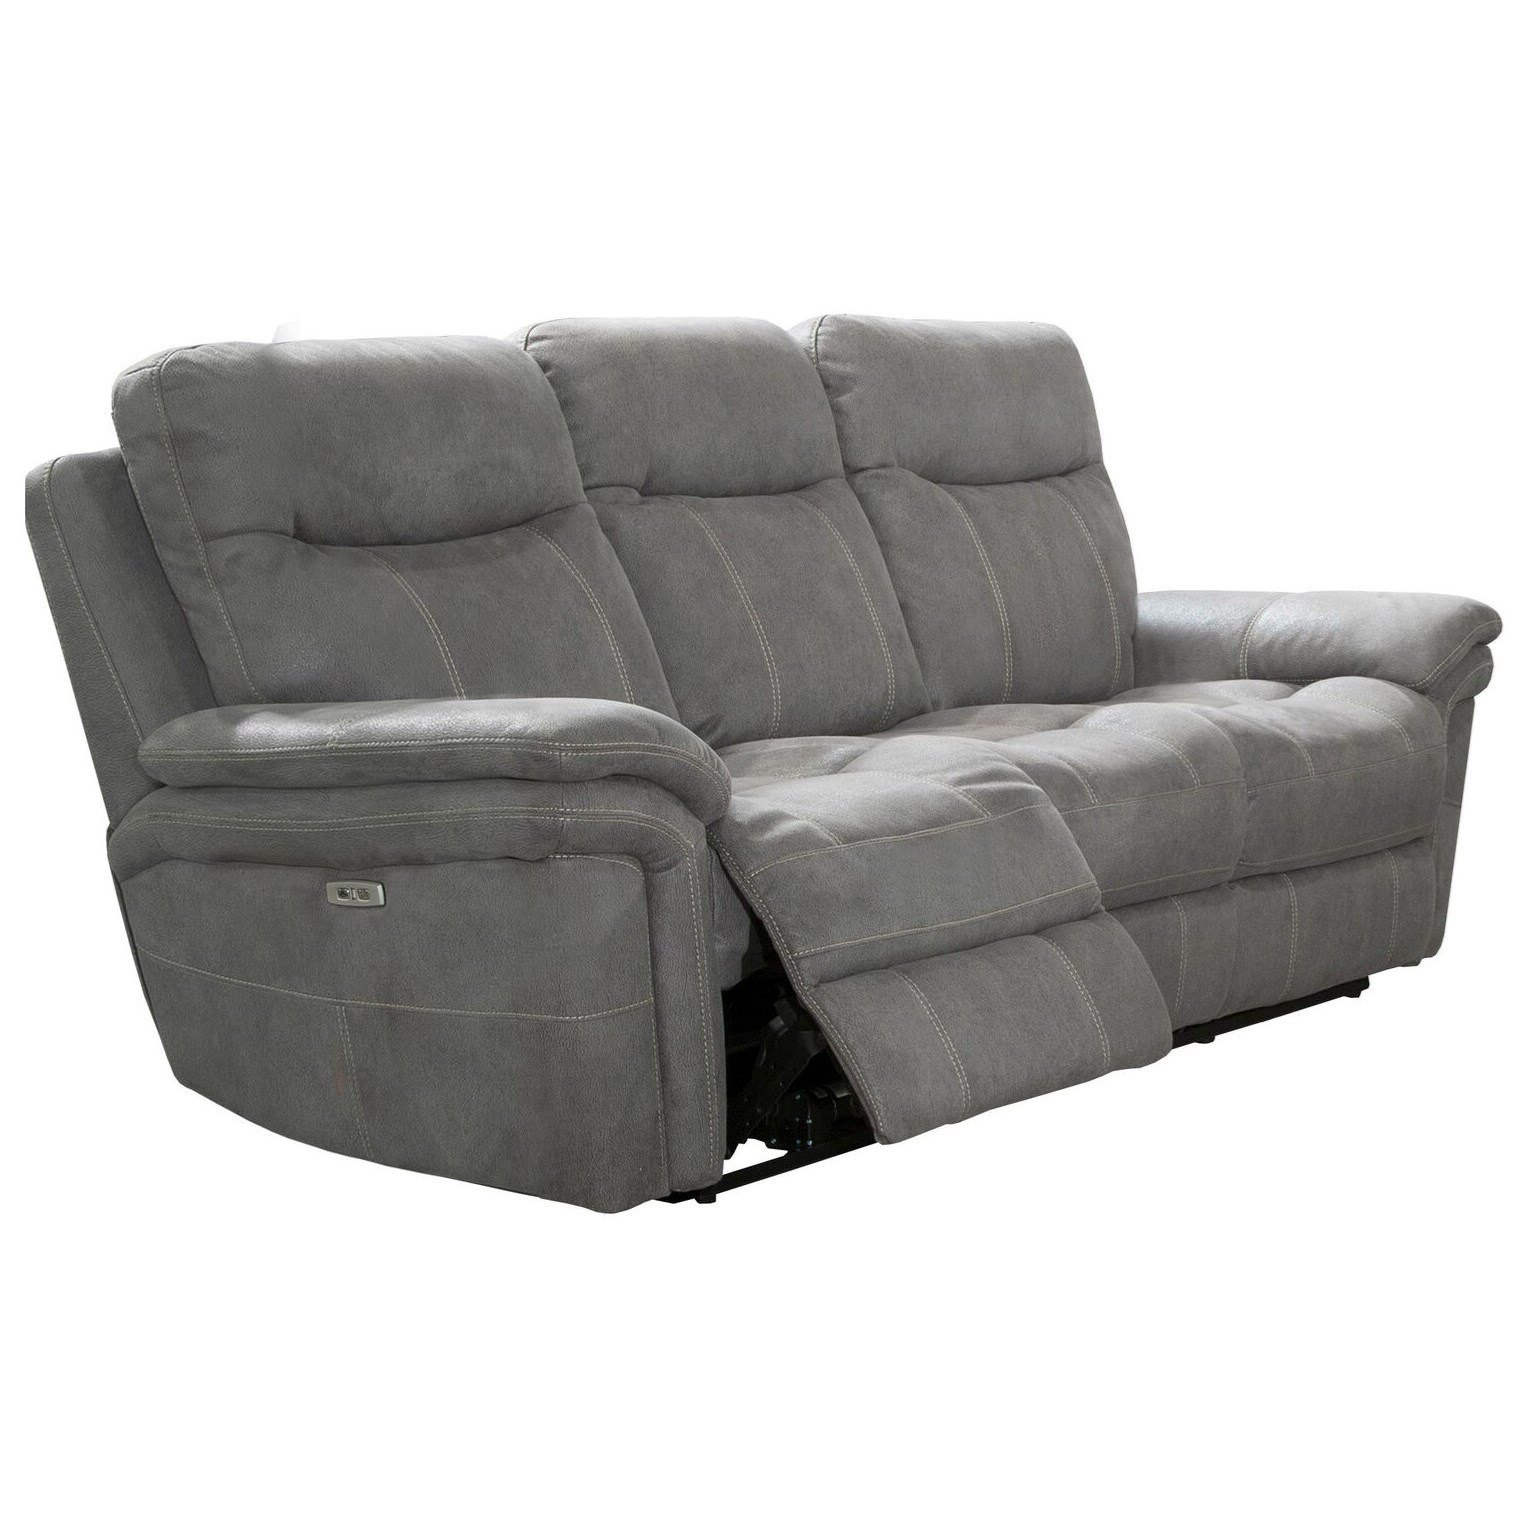 Mason Dual Recliner Power Sofa by Parker Living at Pilgrim Furniture City